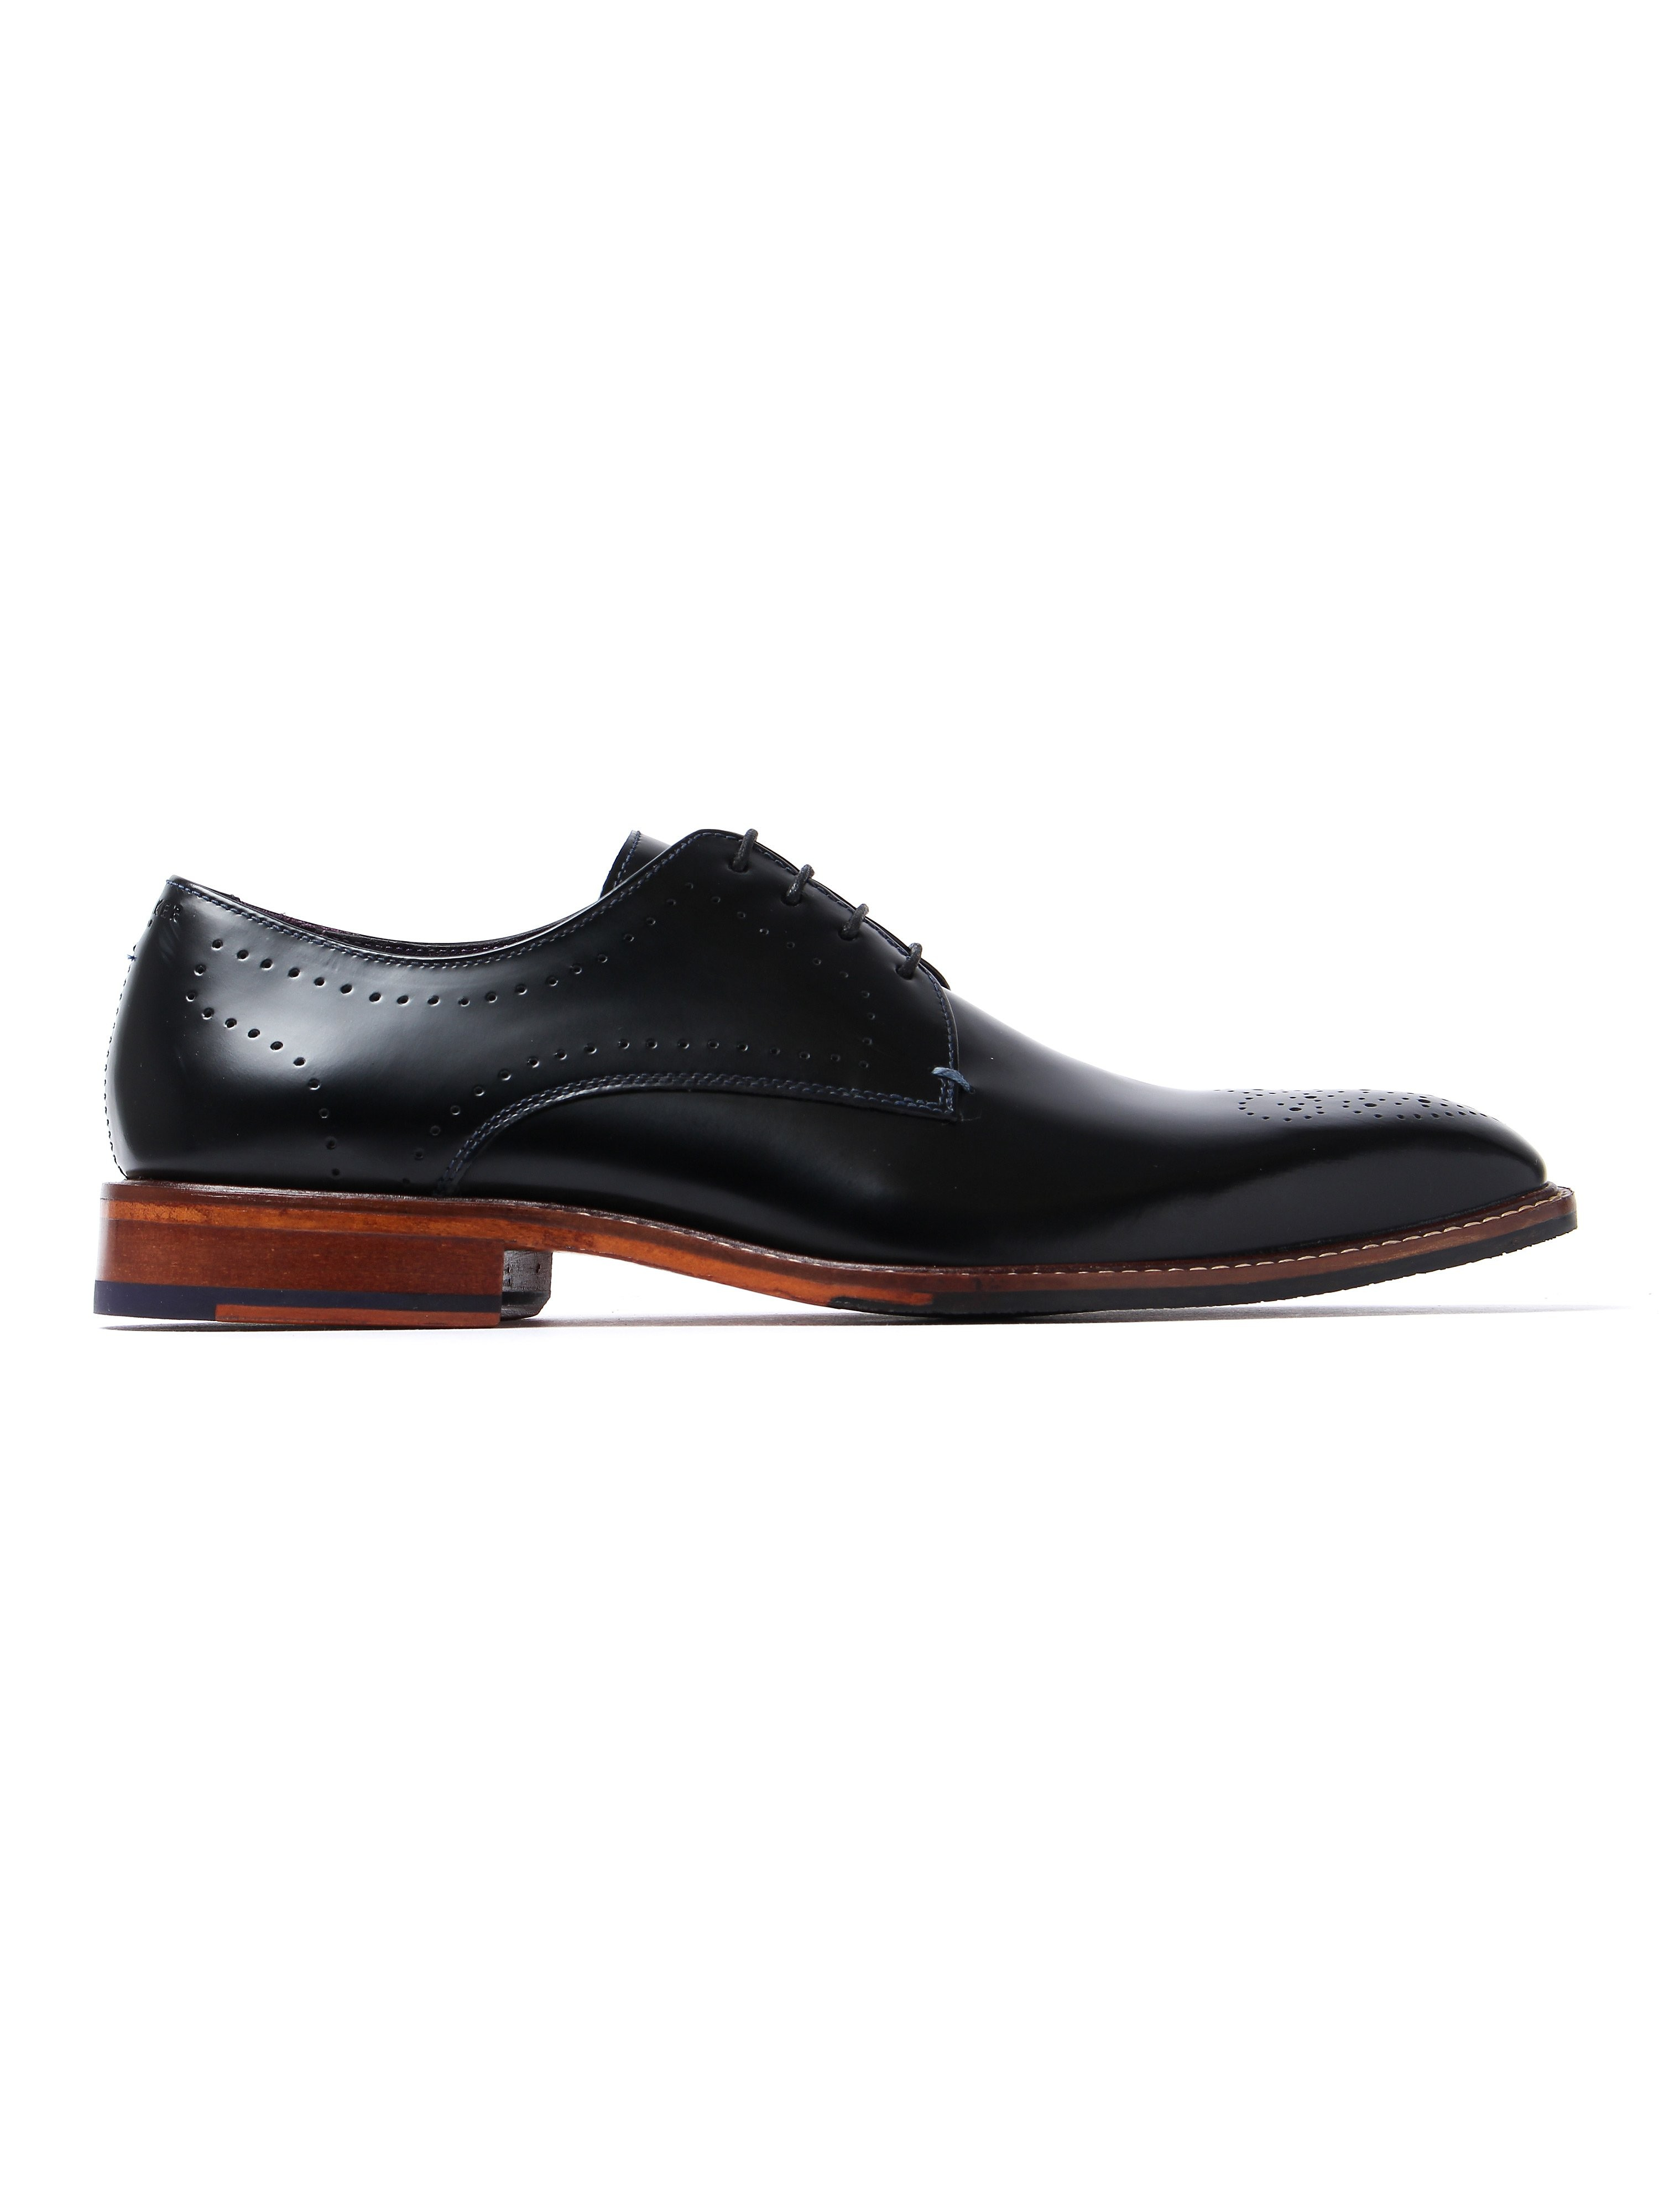 Ted Baker Men's Marar High Shine Derby Shoes - Black Leather